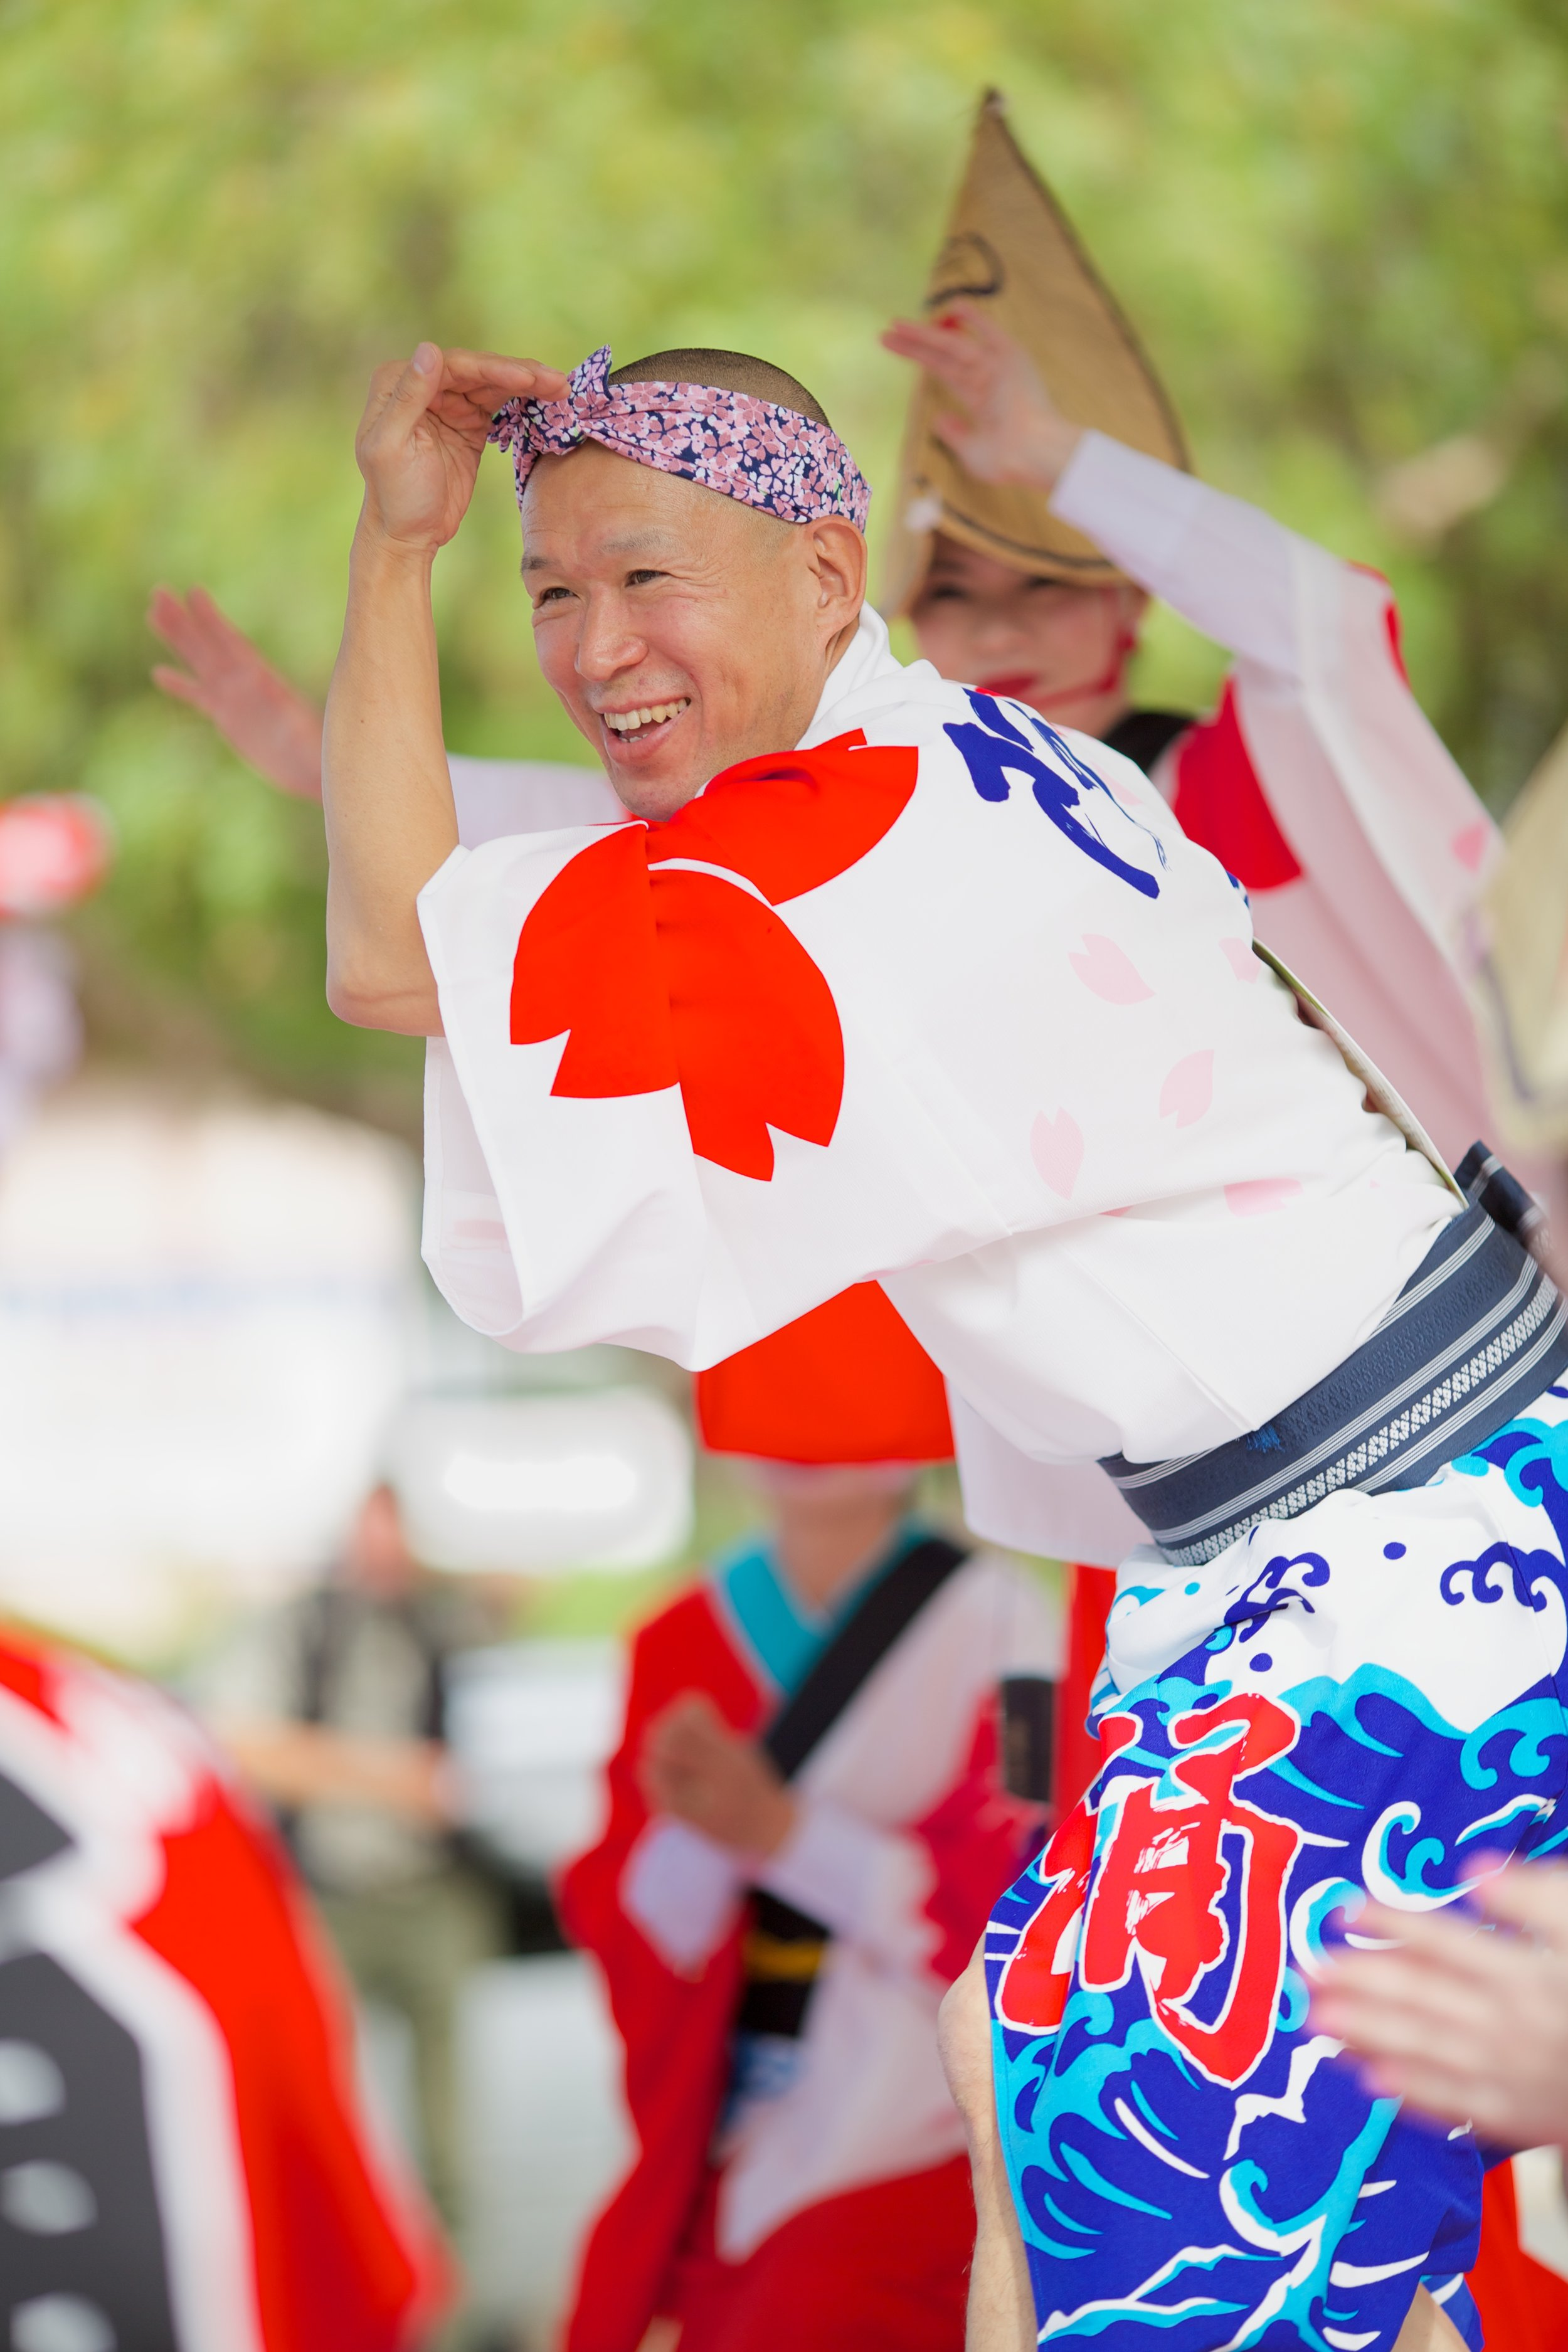 ko---sakura-ren---japanese-cultural-fair-of-santa-cruz-2015_19600929881_o.jpg